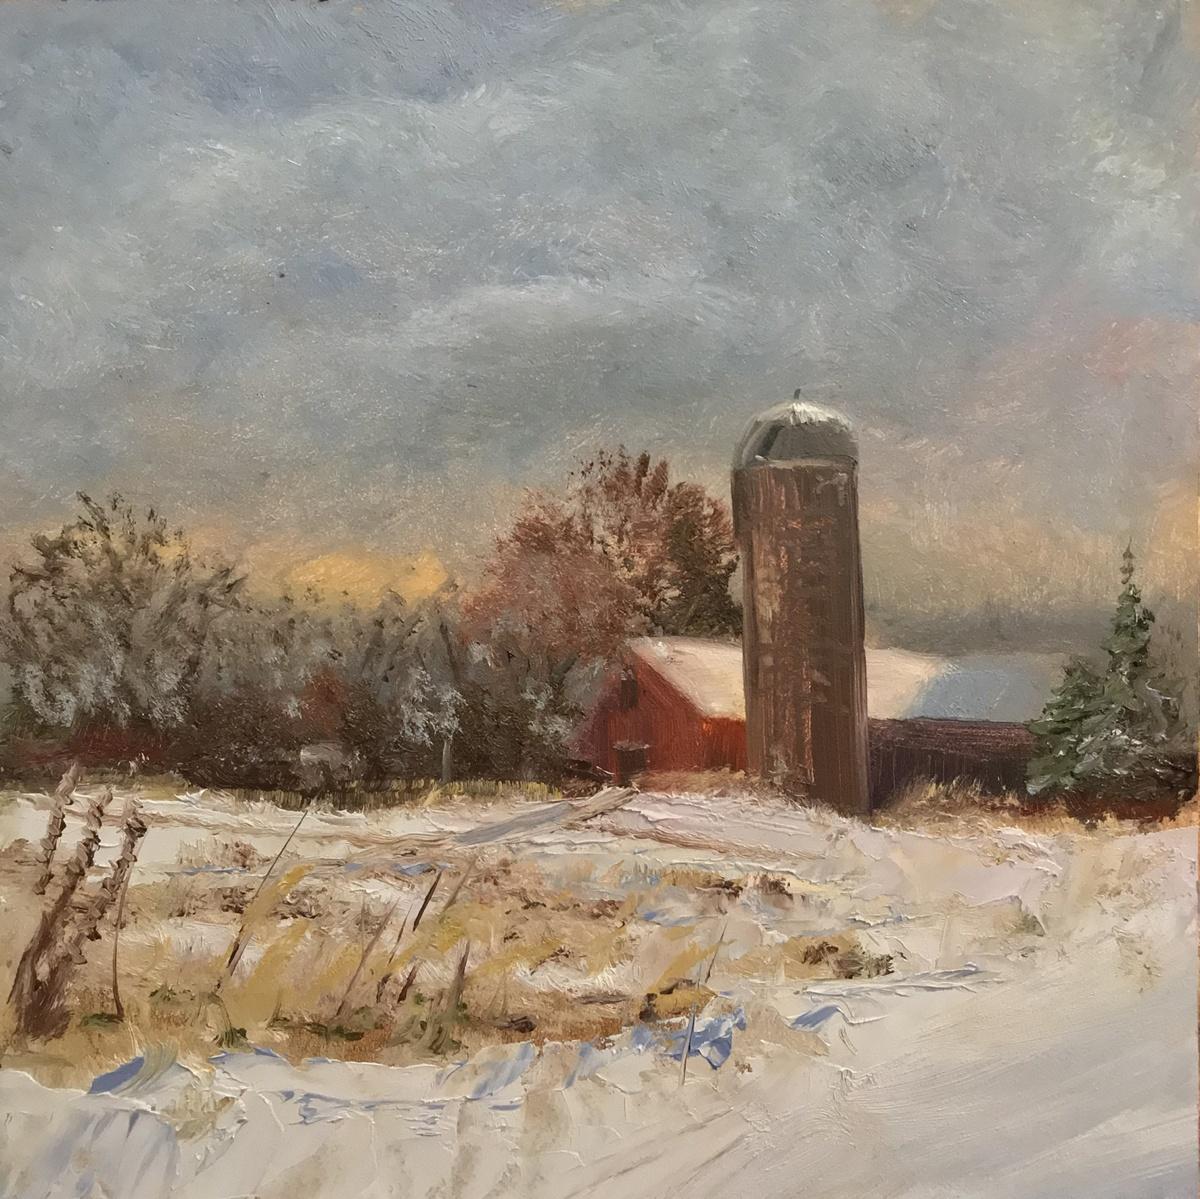 Barn & Silo (large view)